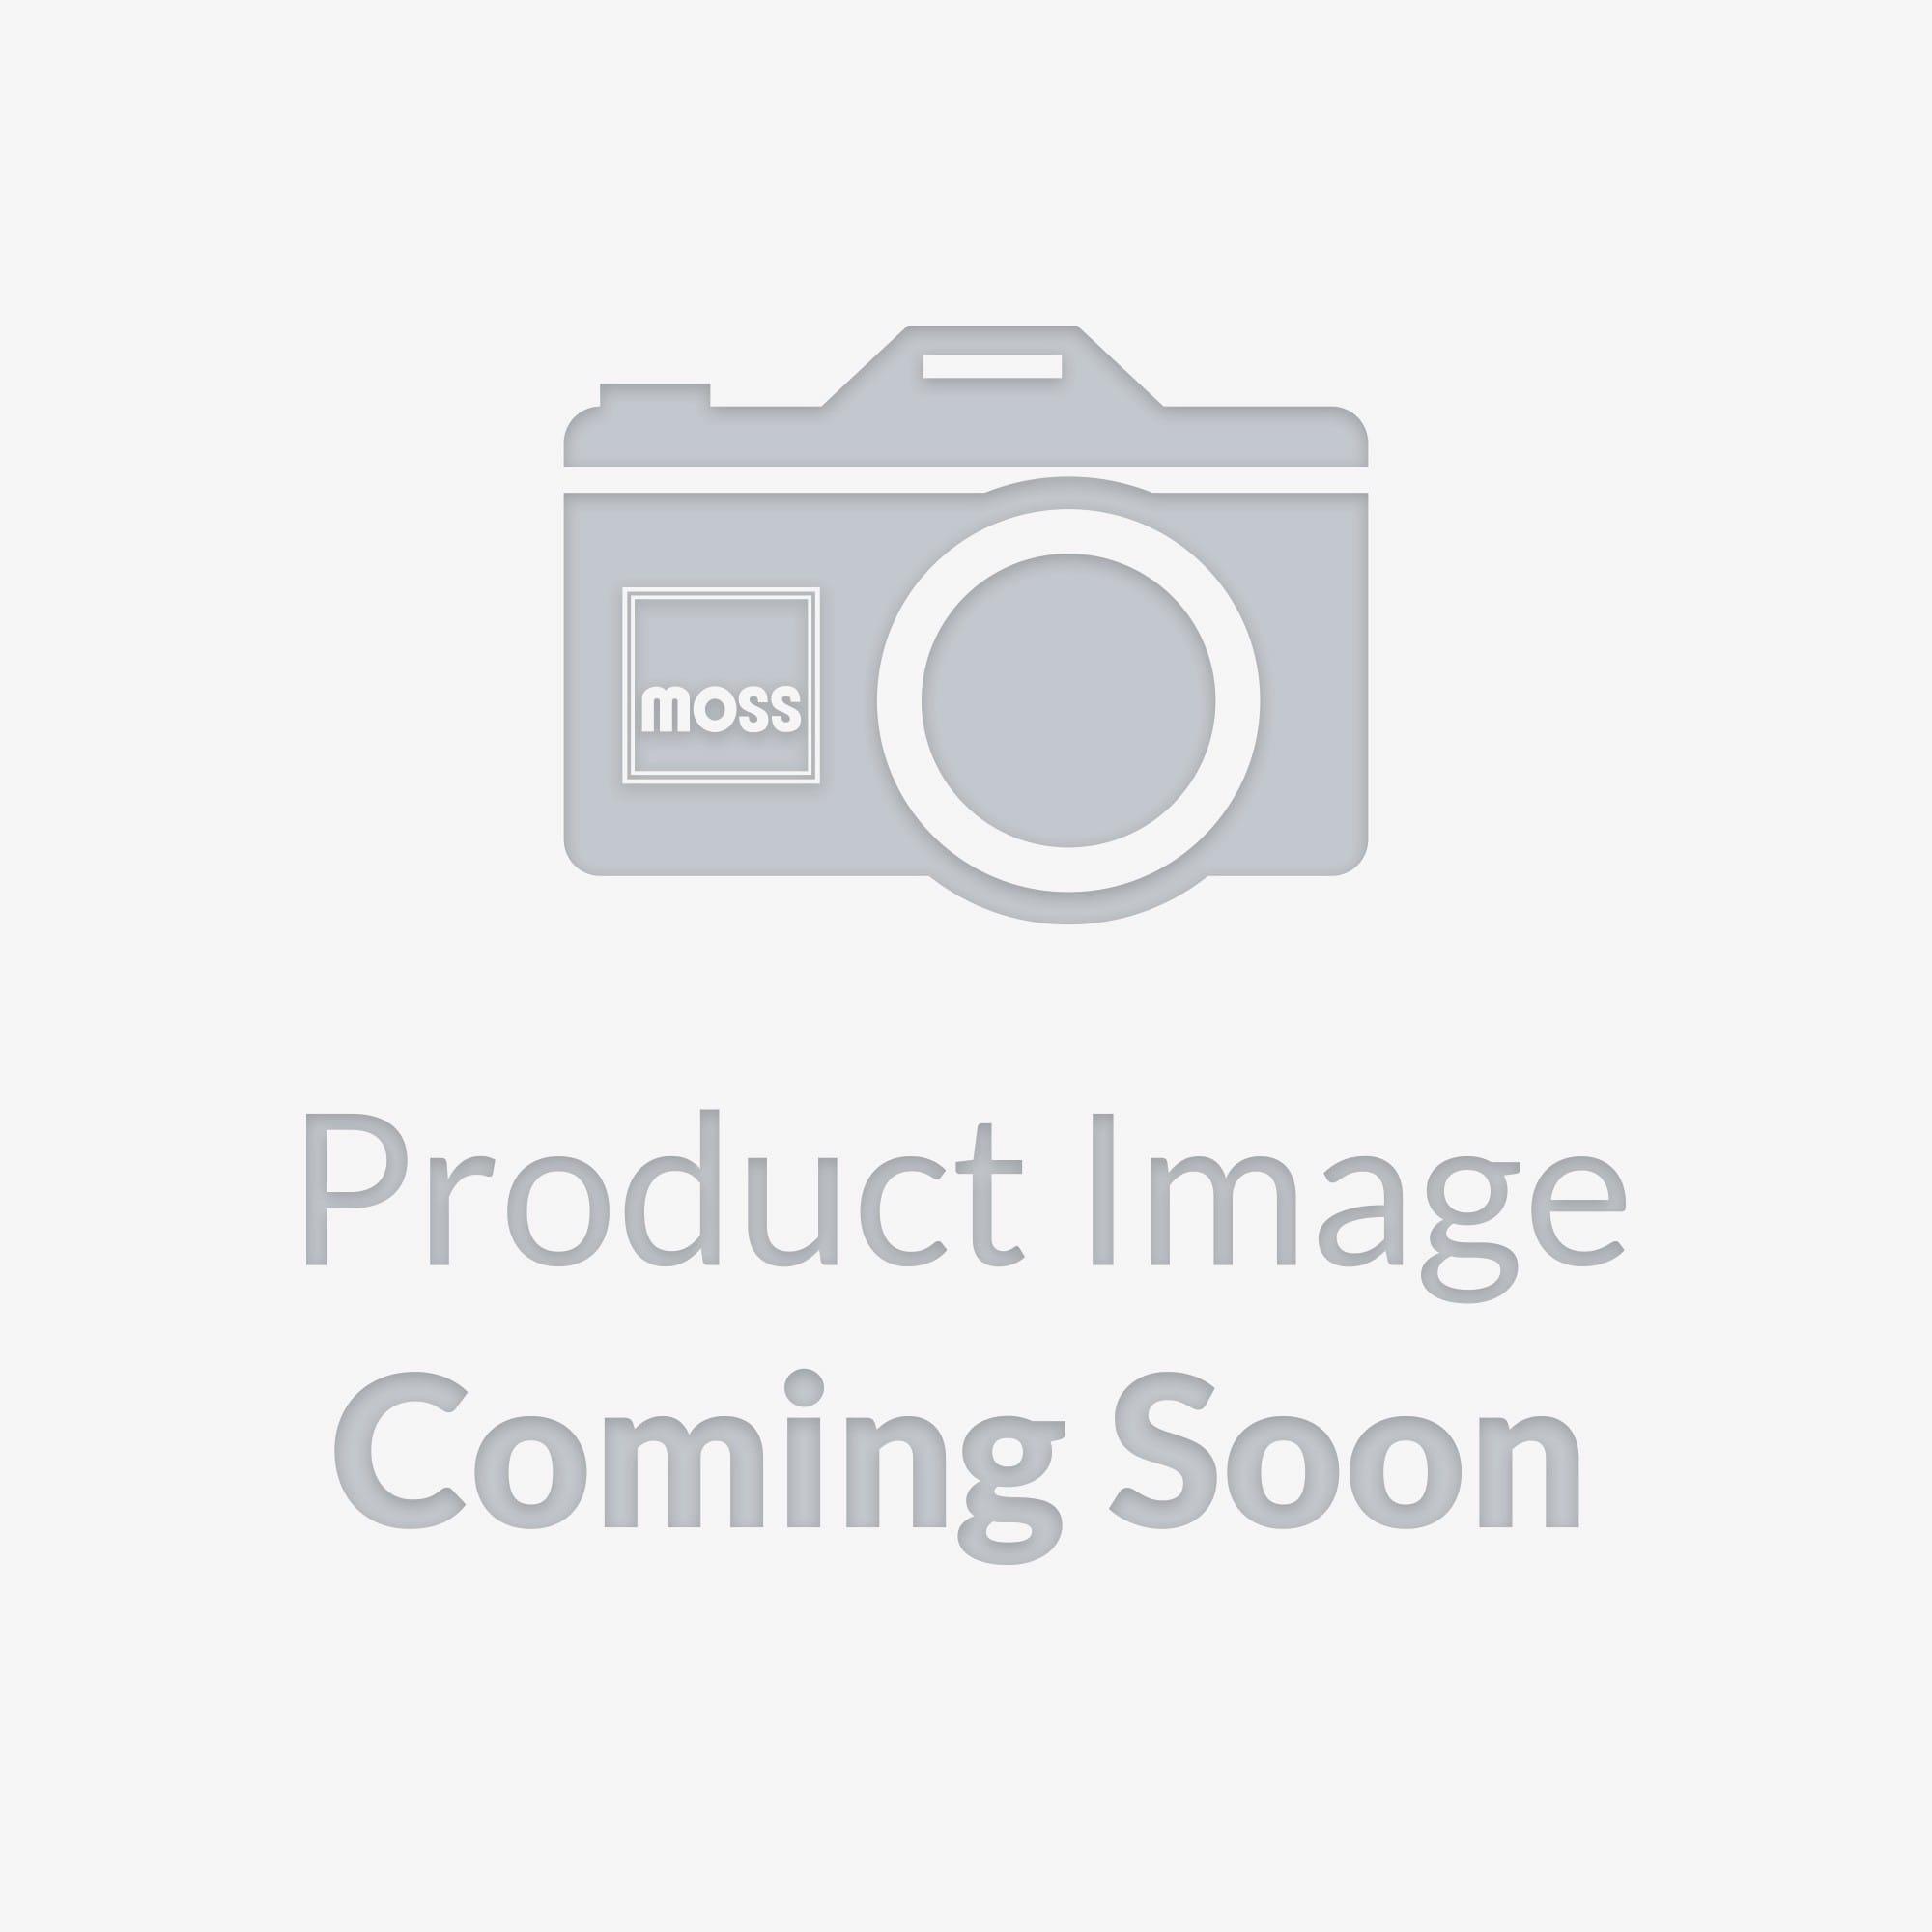 mg tc, mg td, mg tf restoration parts and accessories | moss motors, Wiring diagram